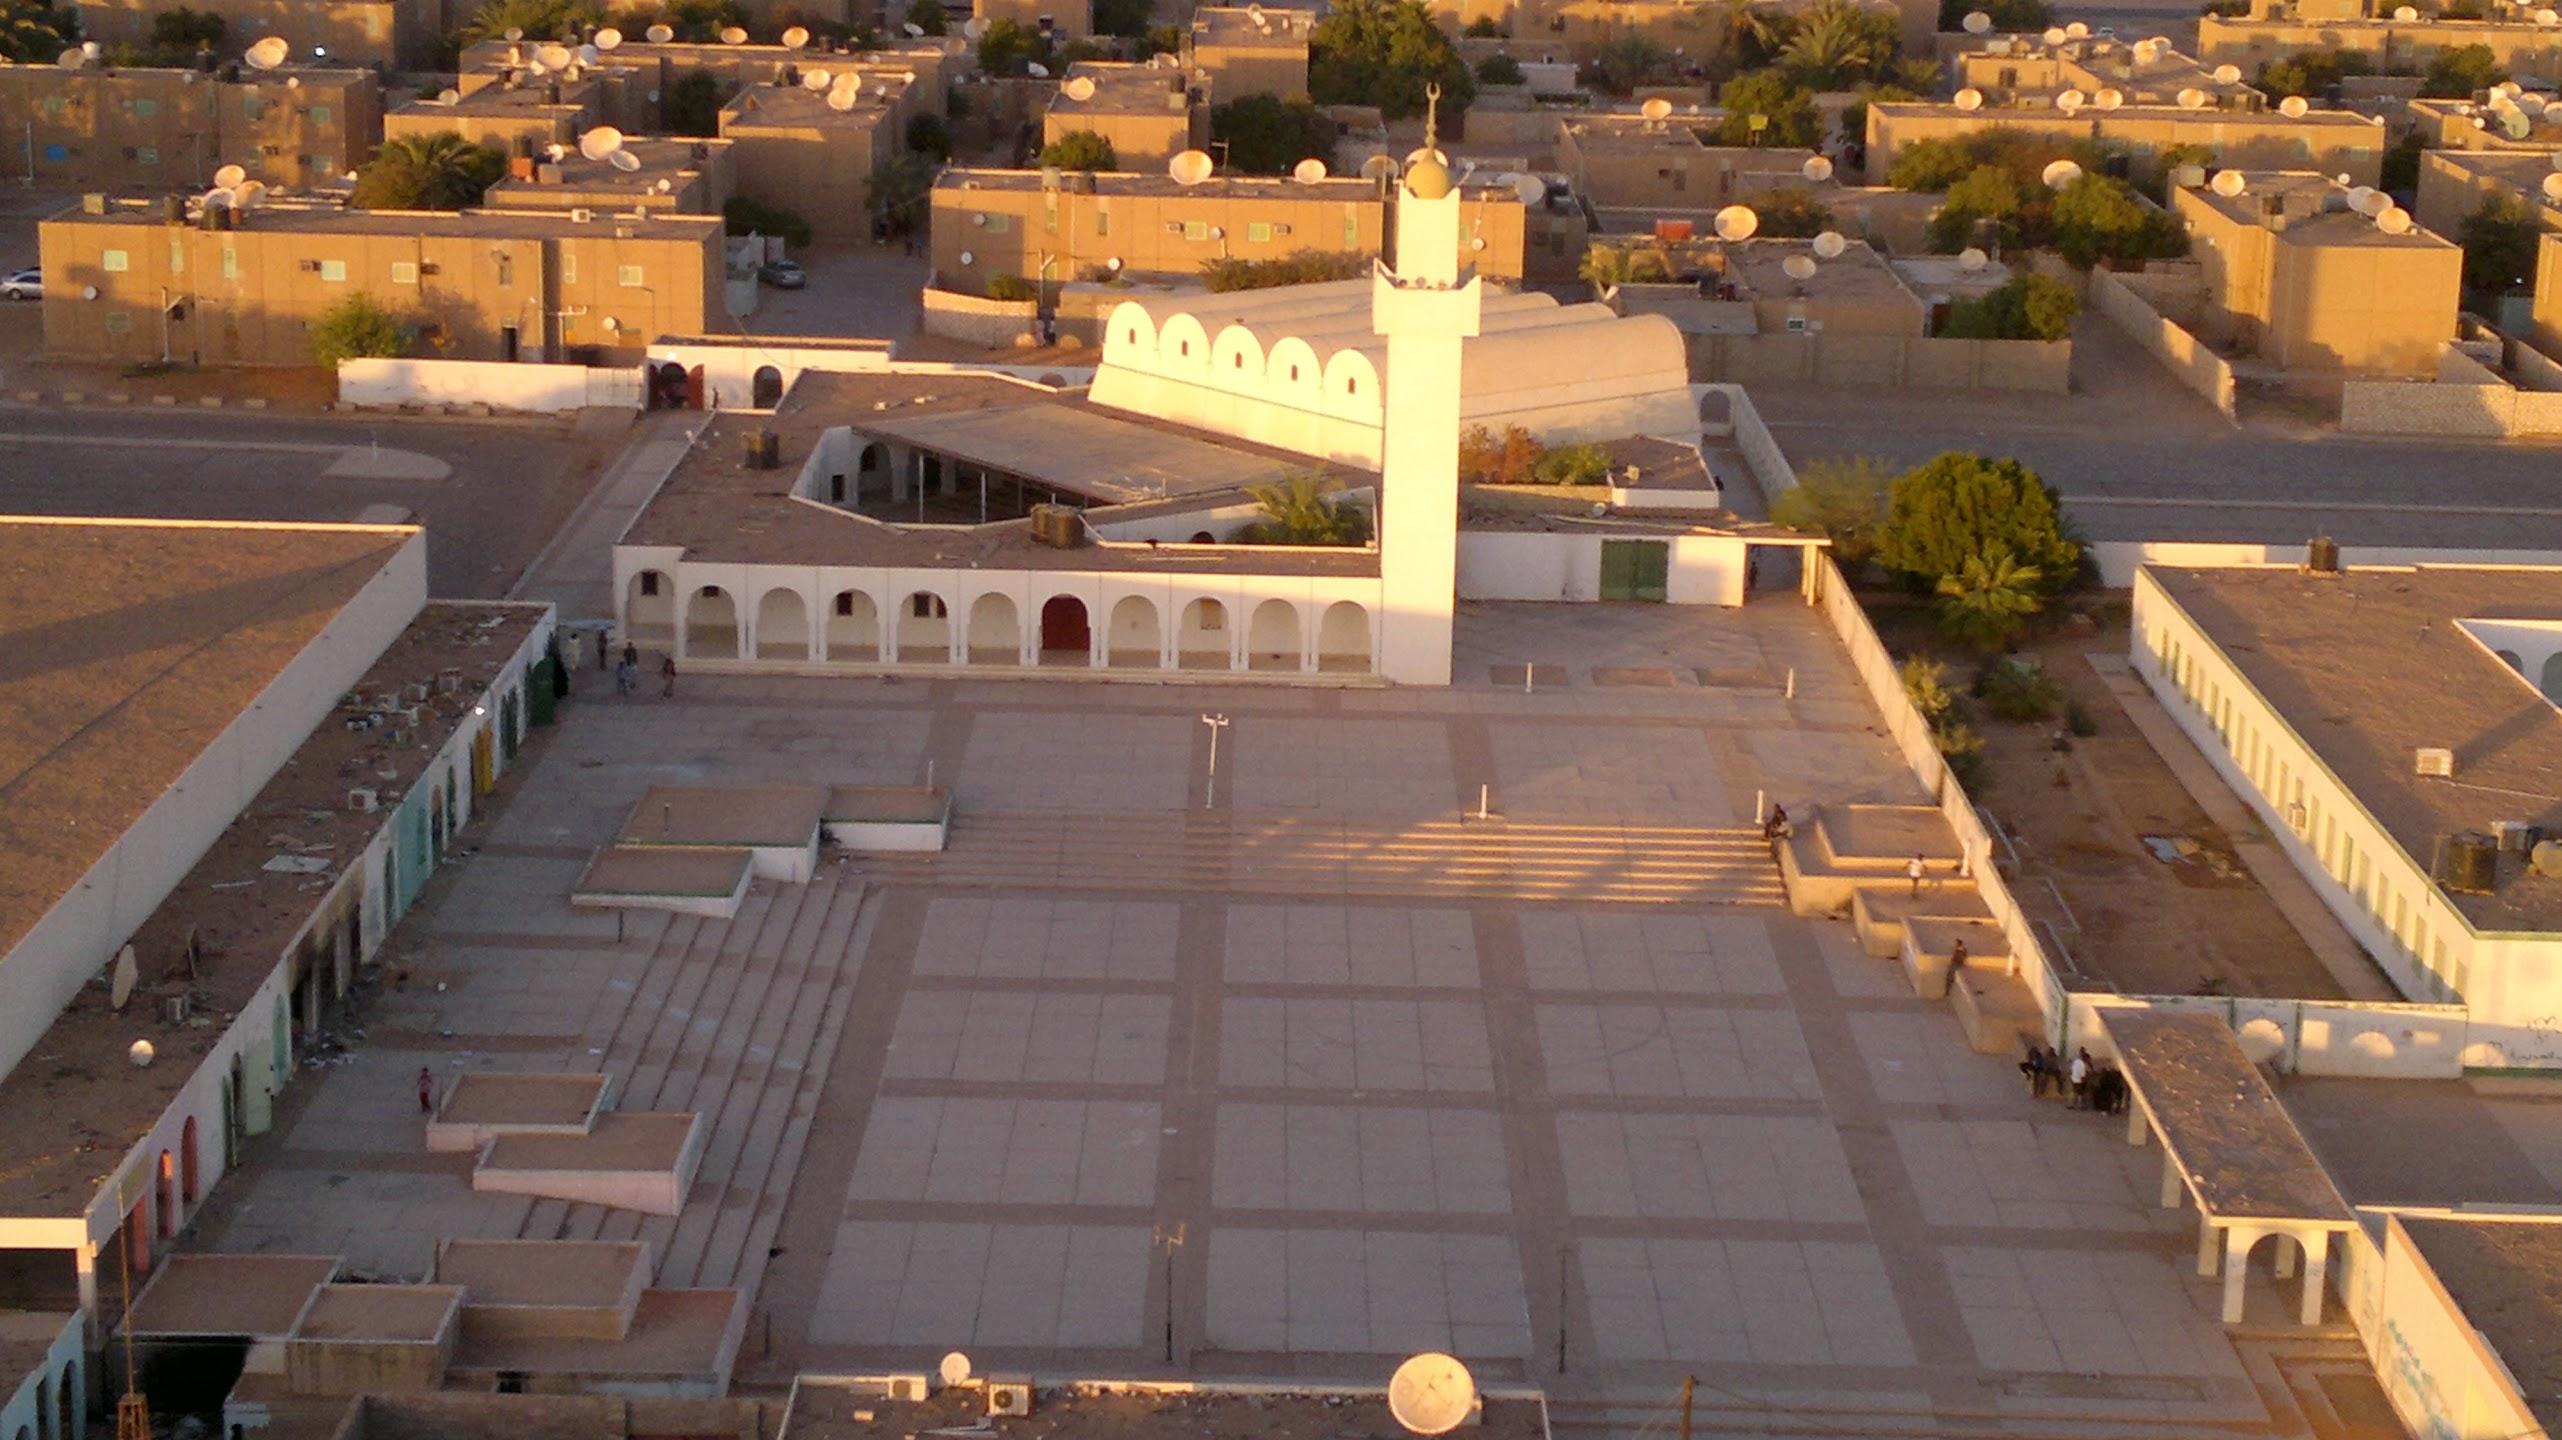 Mezquita Ansar, en Kufra, en el Desierto del Sahara, Libia. Foto: Eazalidin Eabdallah Muhamad Yuski